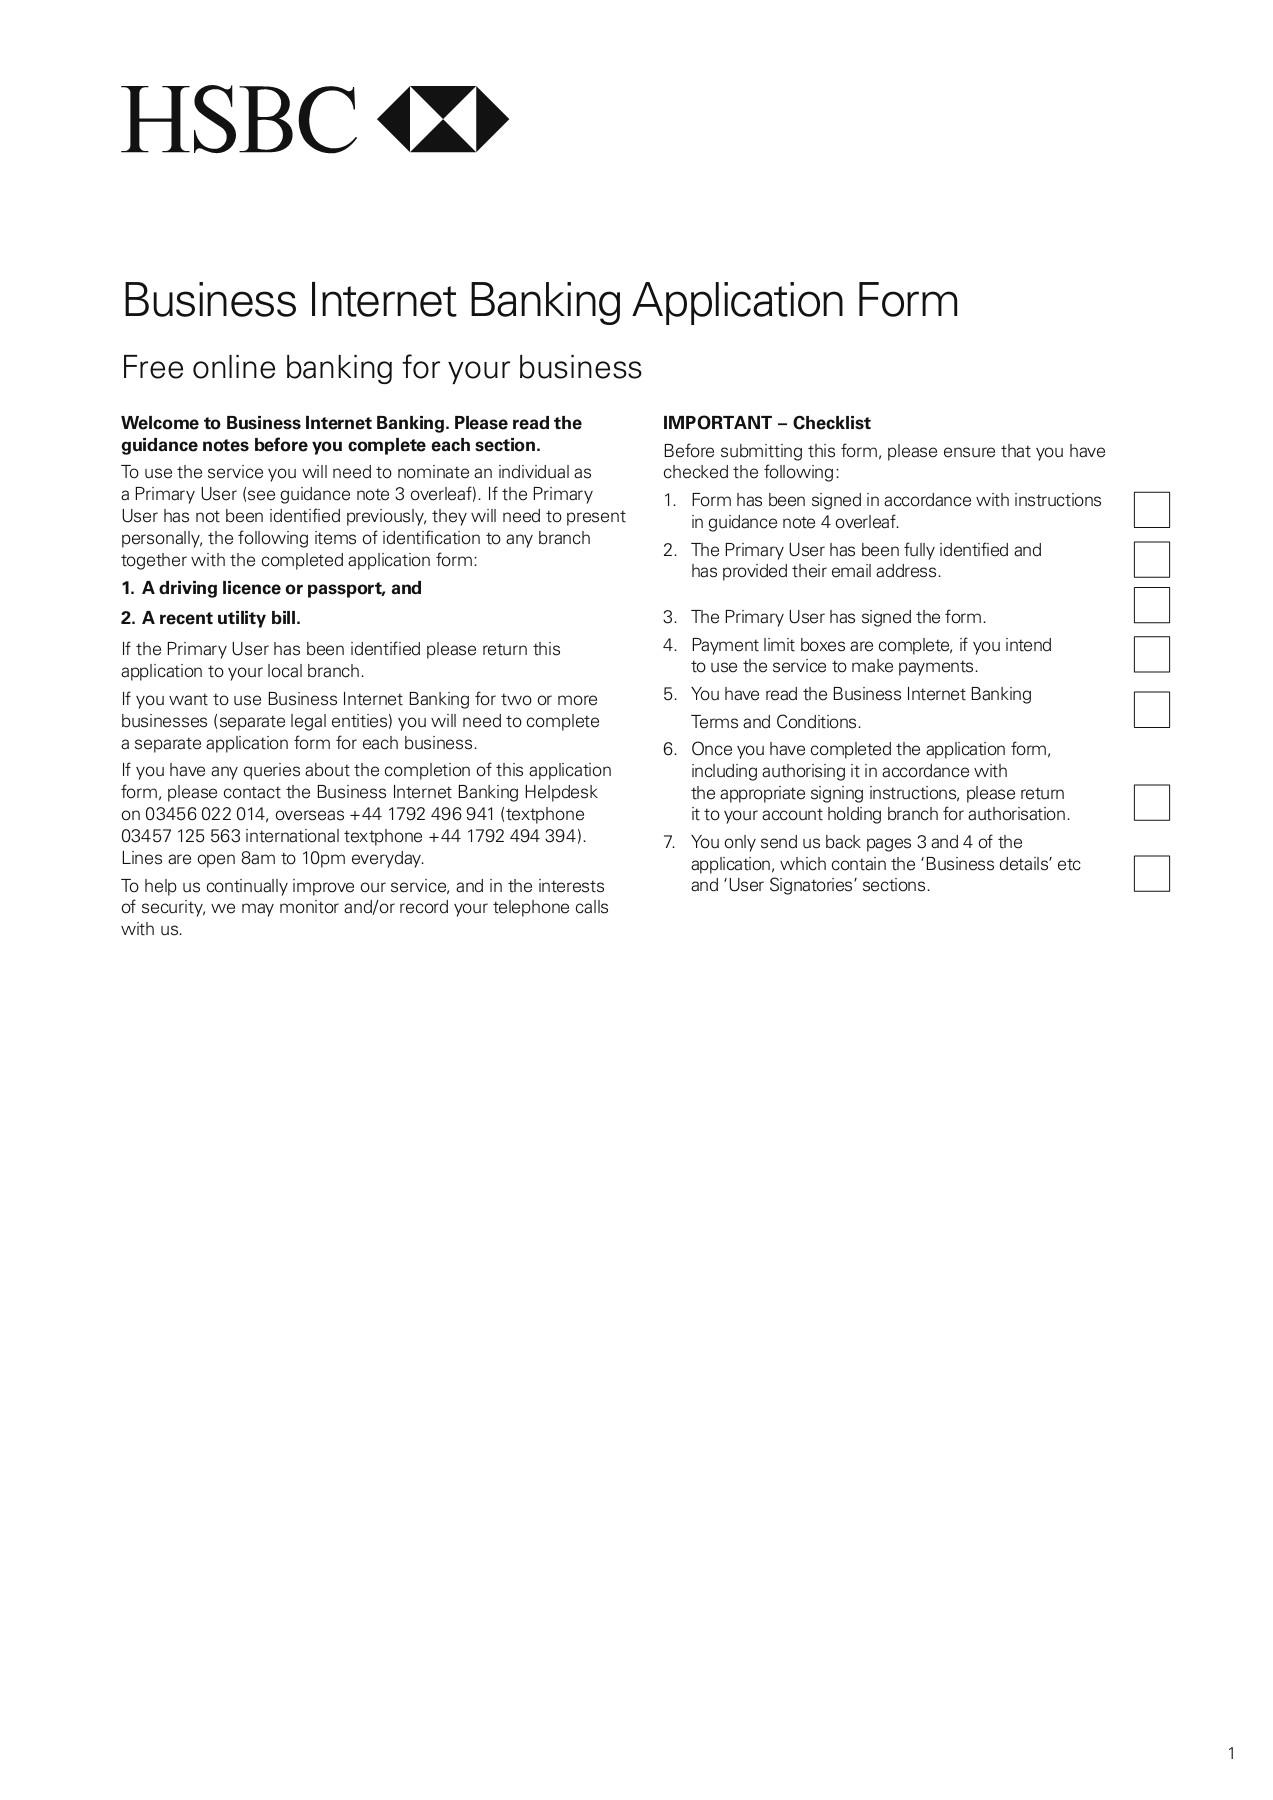 Business Internet Banking Application Form Hsbc Bank